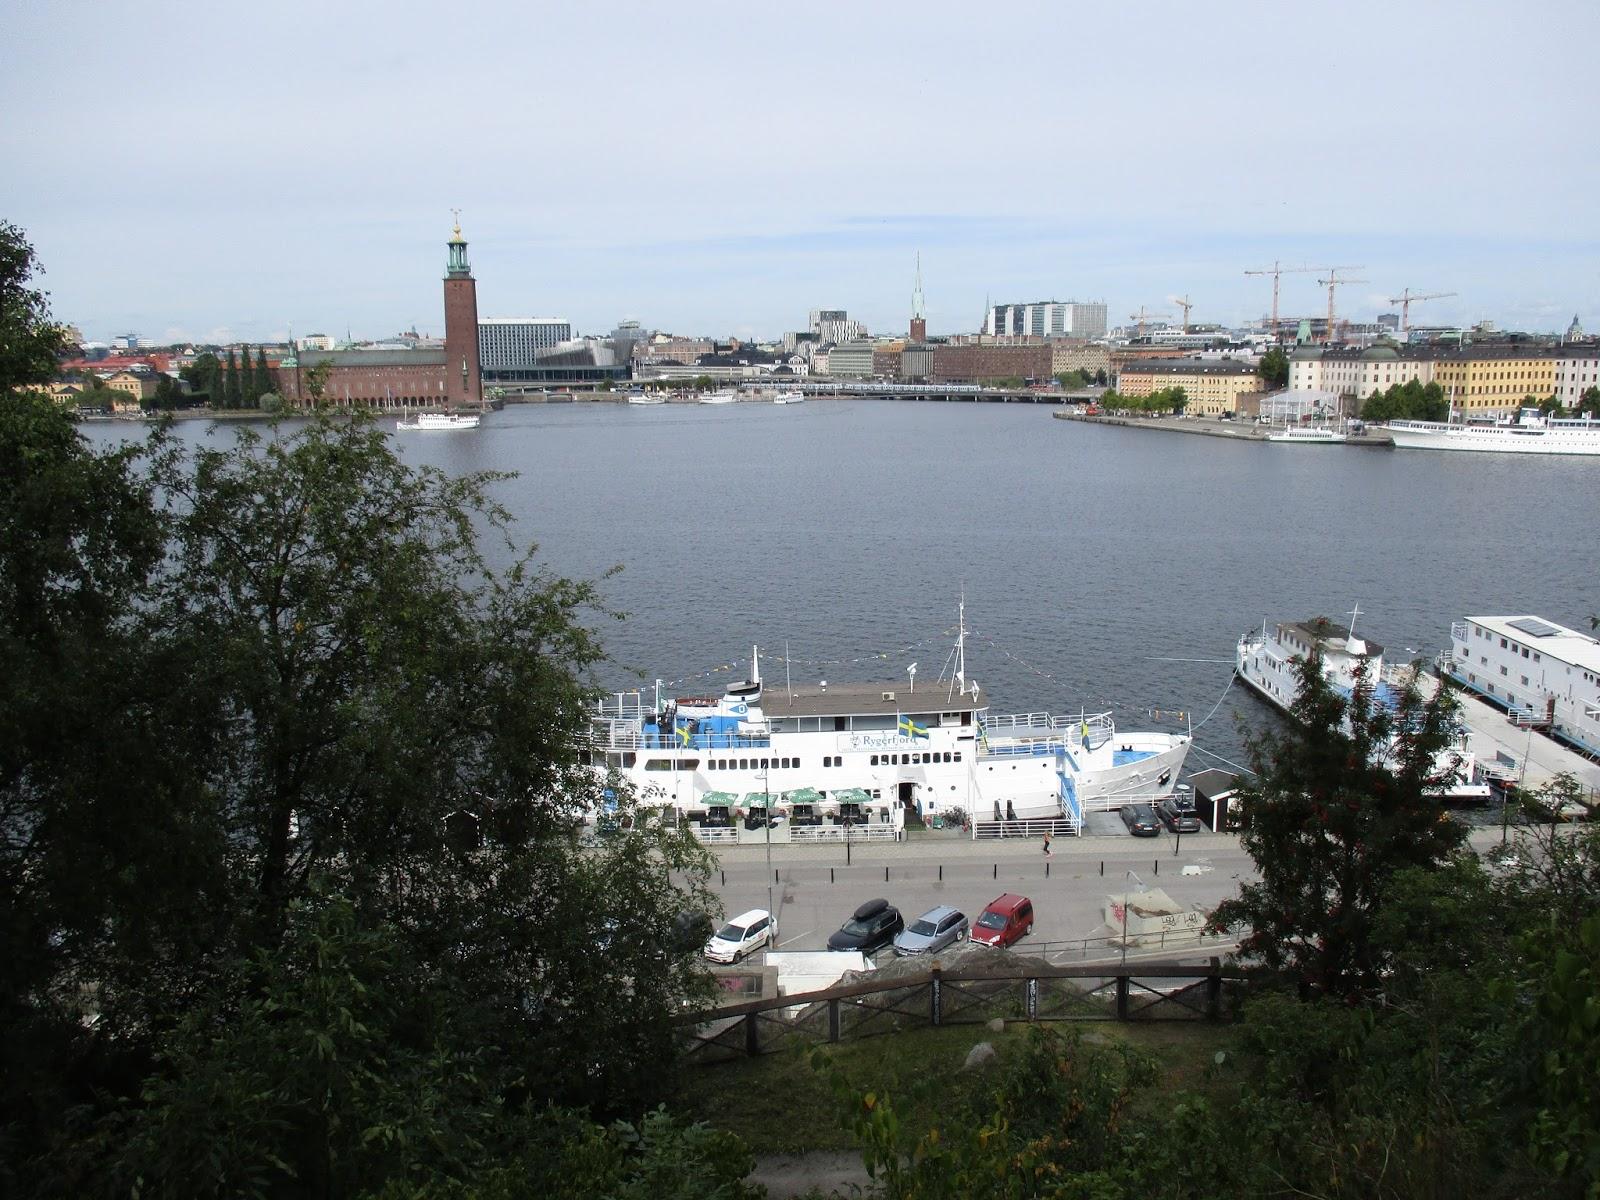 lunch ledsagare svälja i Stockholm